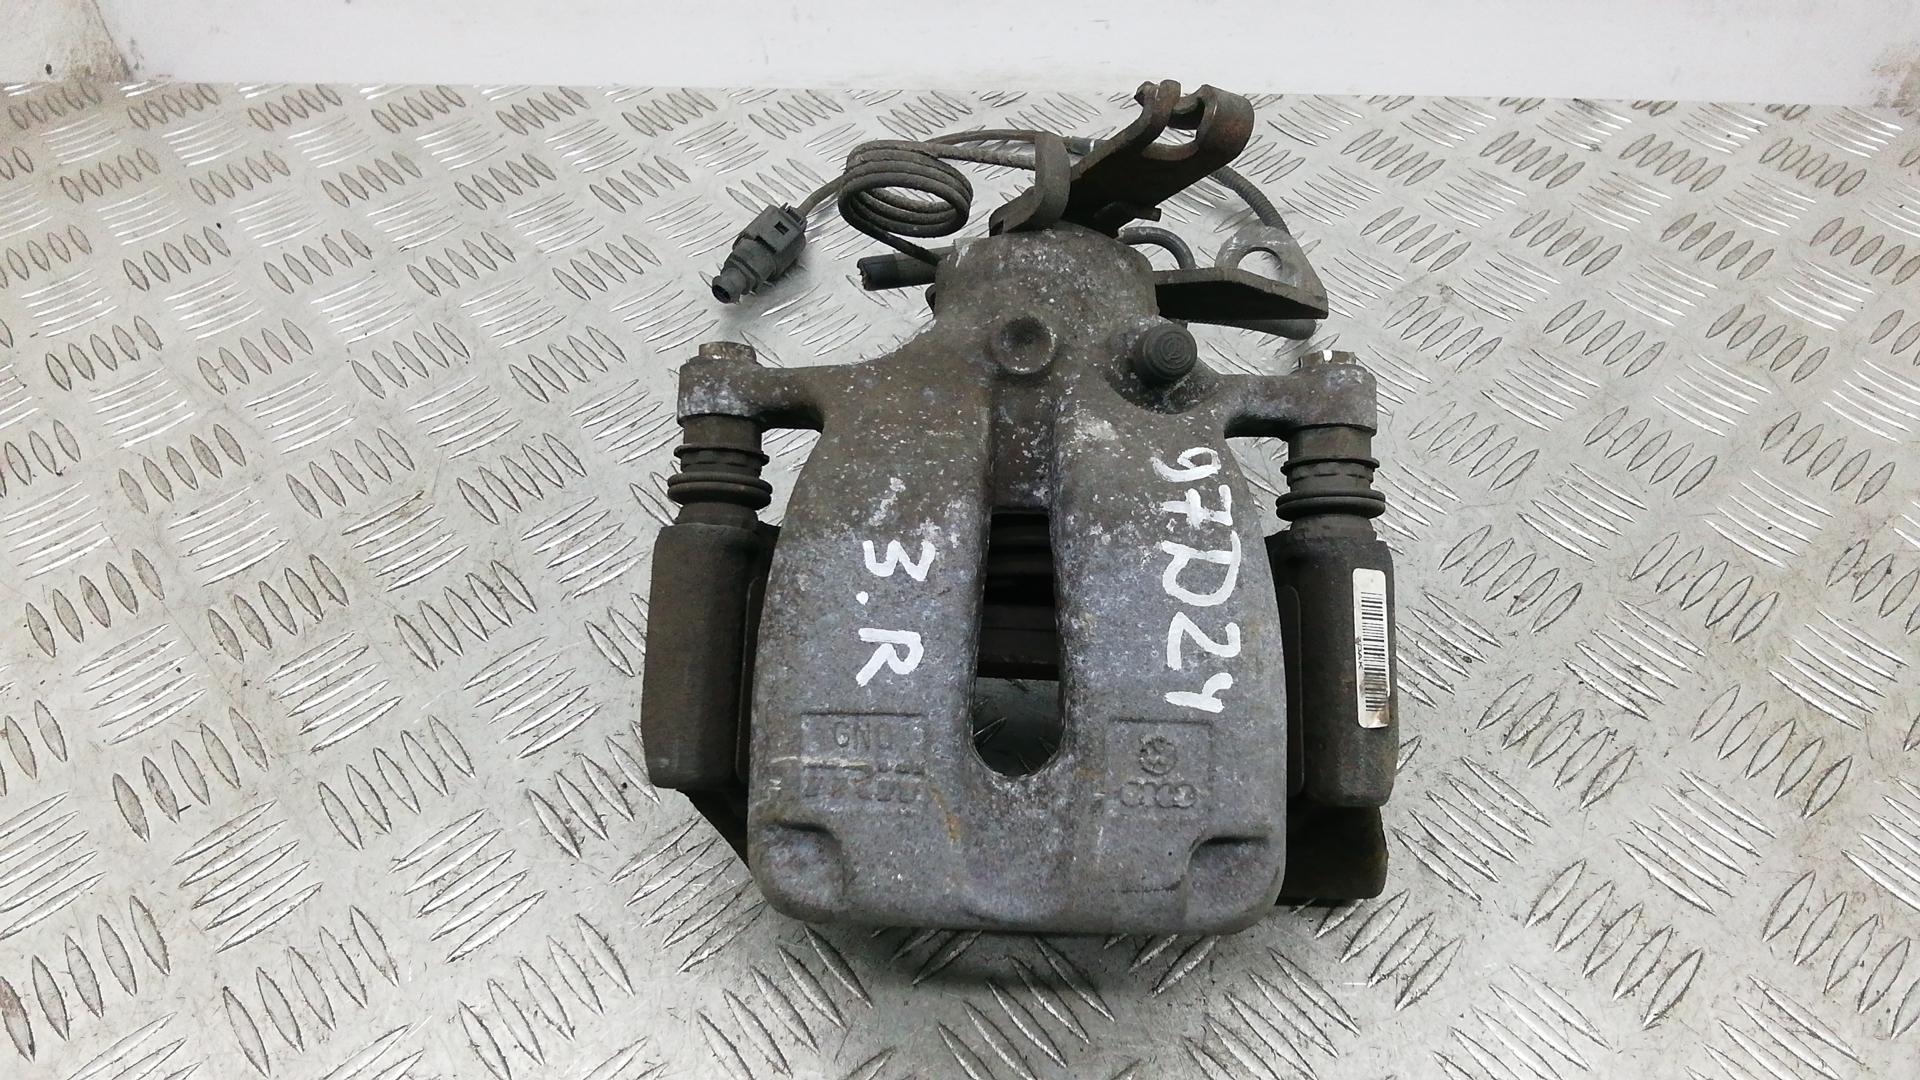 Суппорт тормозной задний правый, VOLKSWAGEN, PHAETON 1, 2005